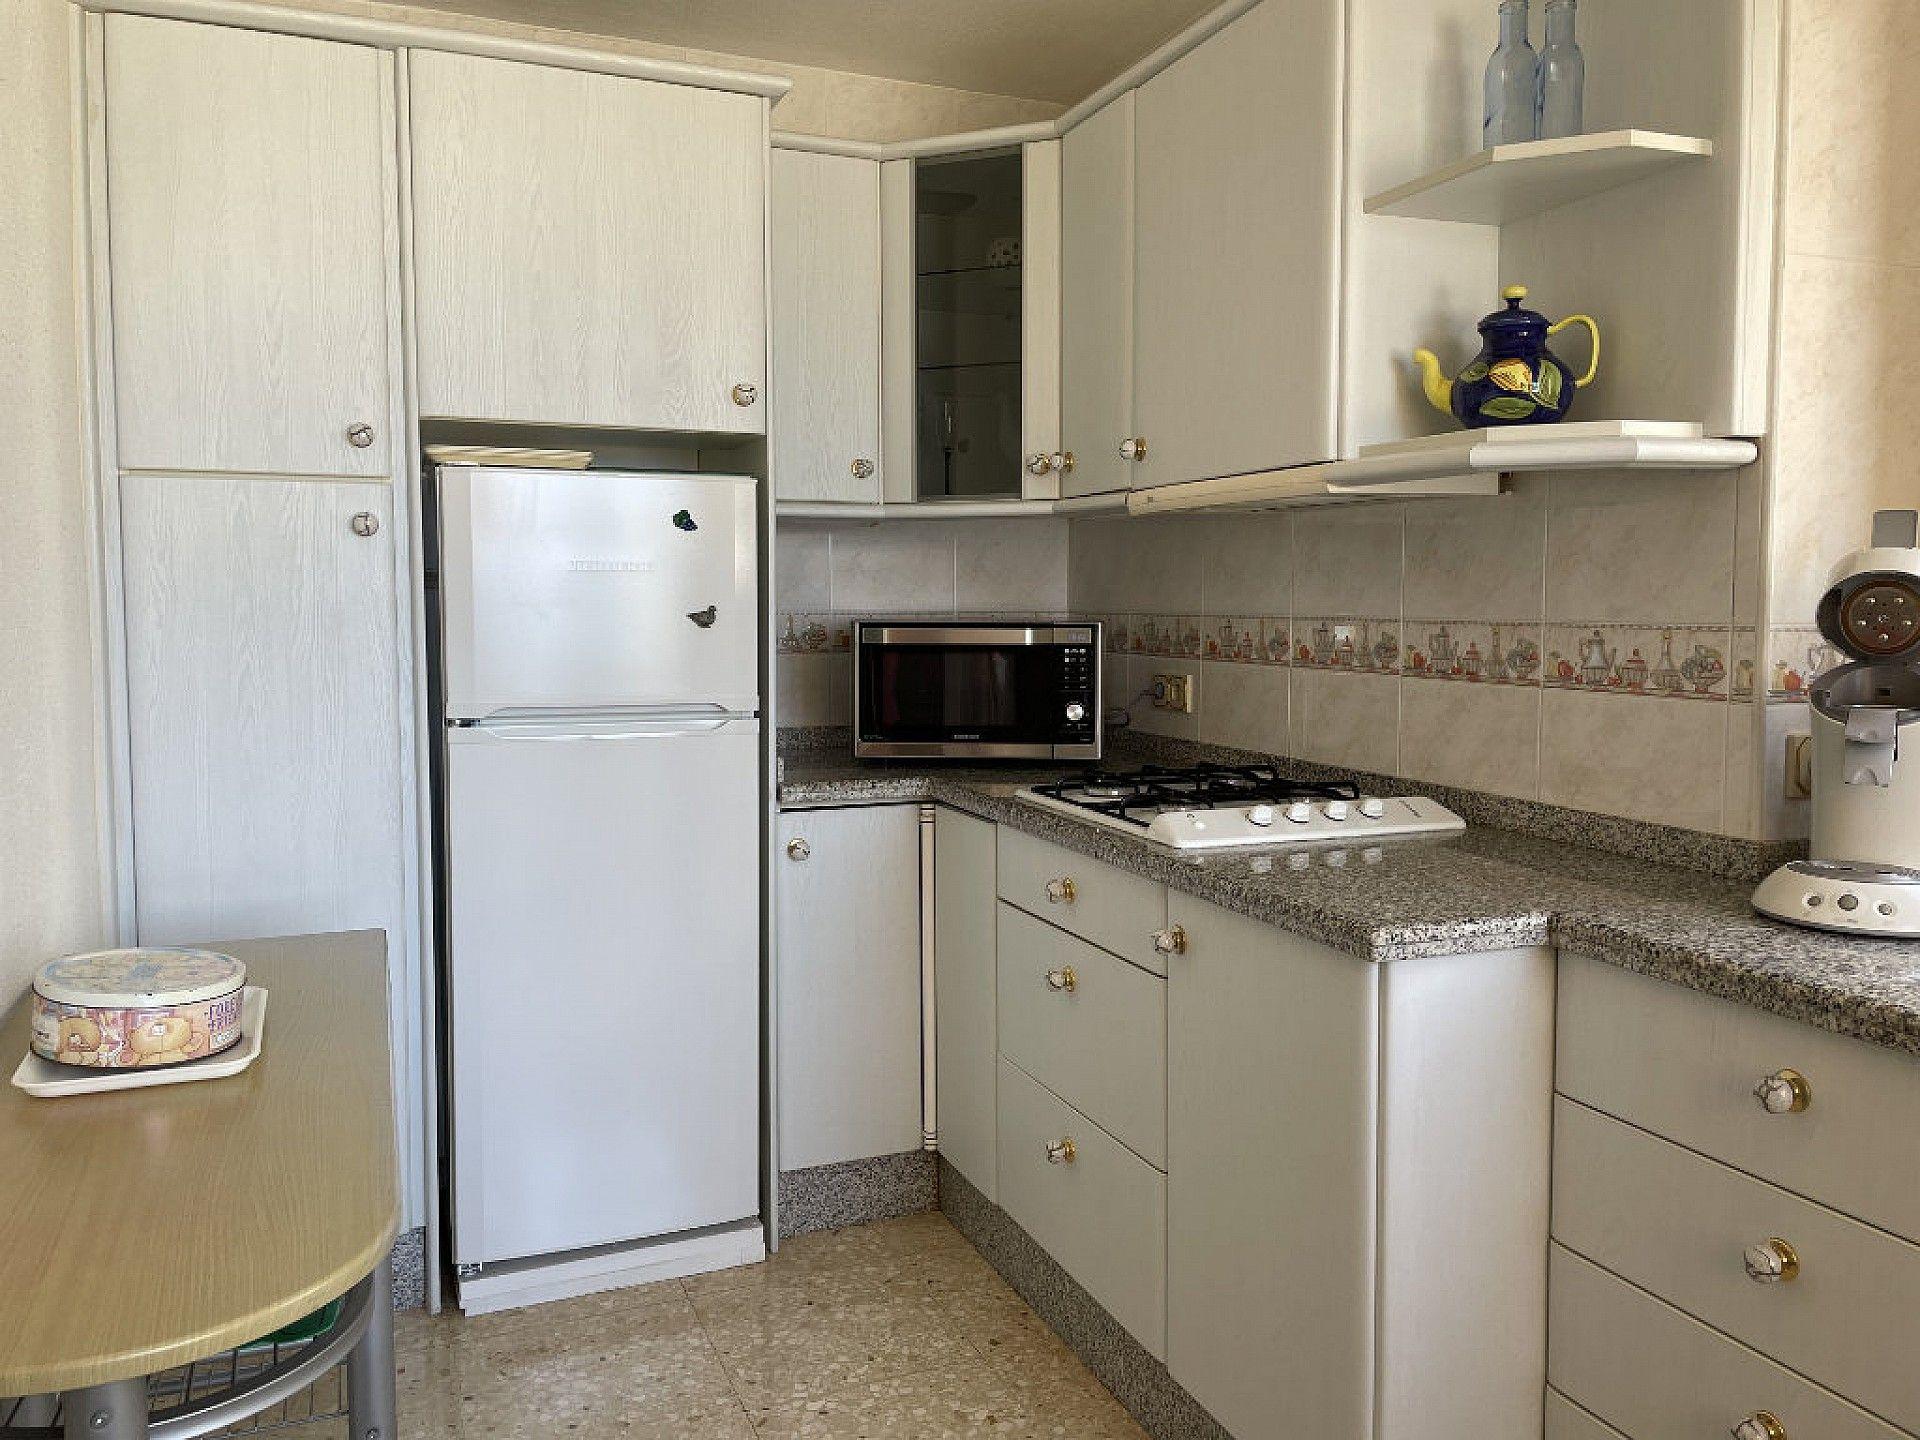 w_appartement-tekoop-costa-blanca-calpe-a1068-spanje10.jpg